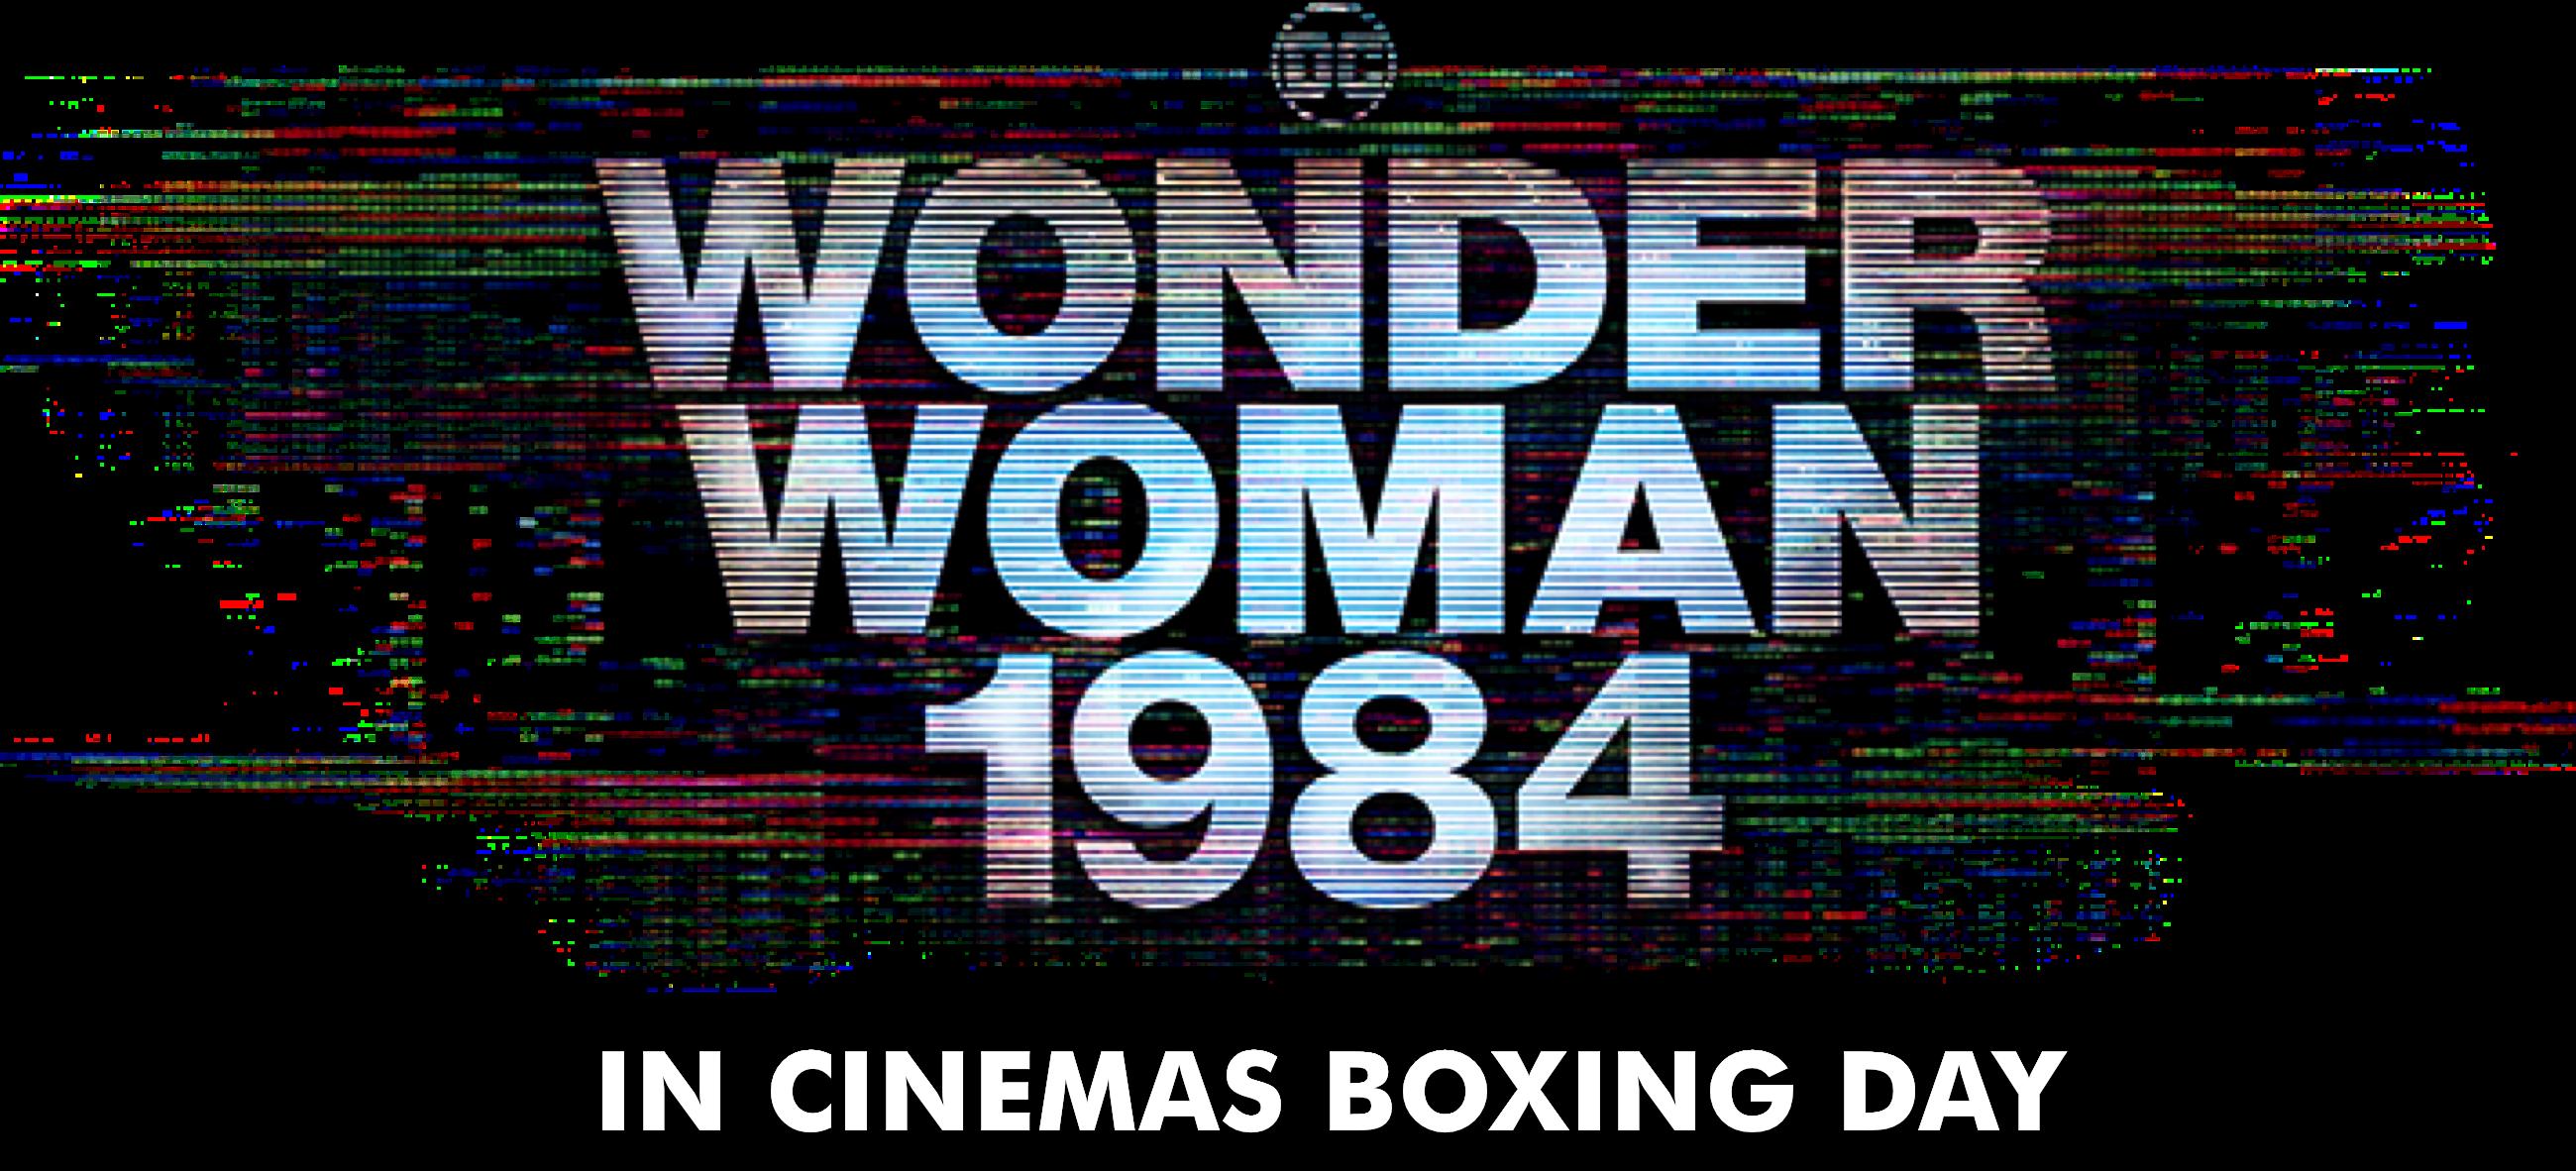 Wonder Woman 1984 : %$SYNOPSIS%   Roadshow Films